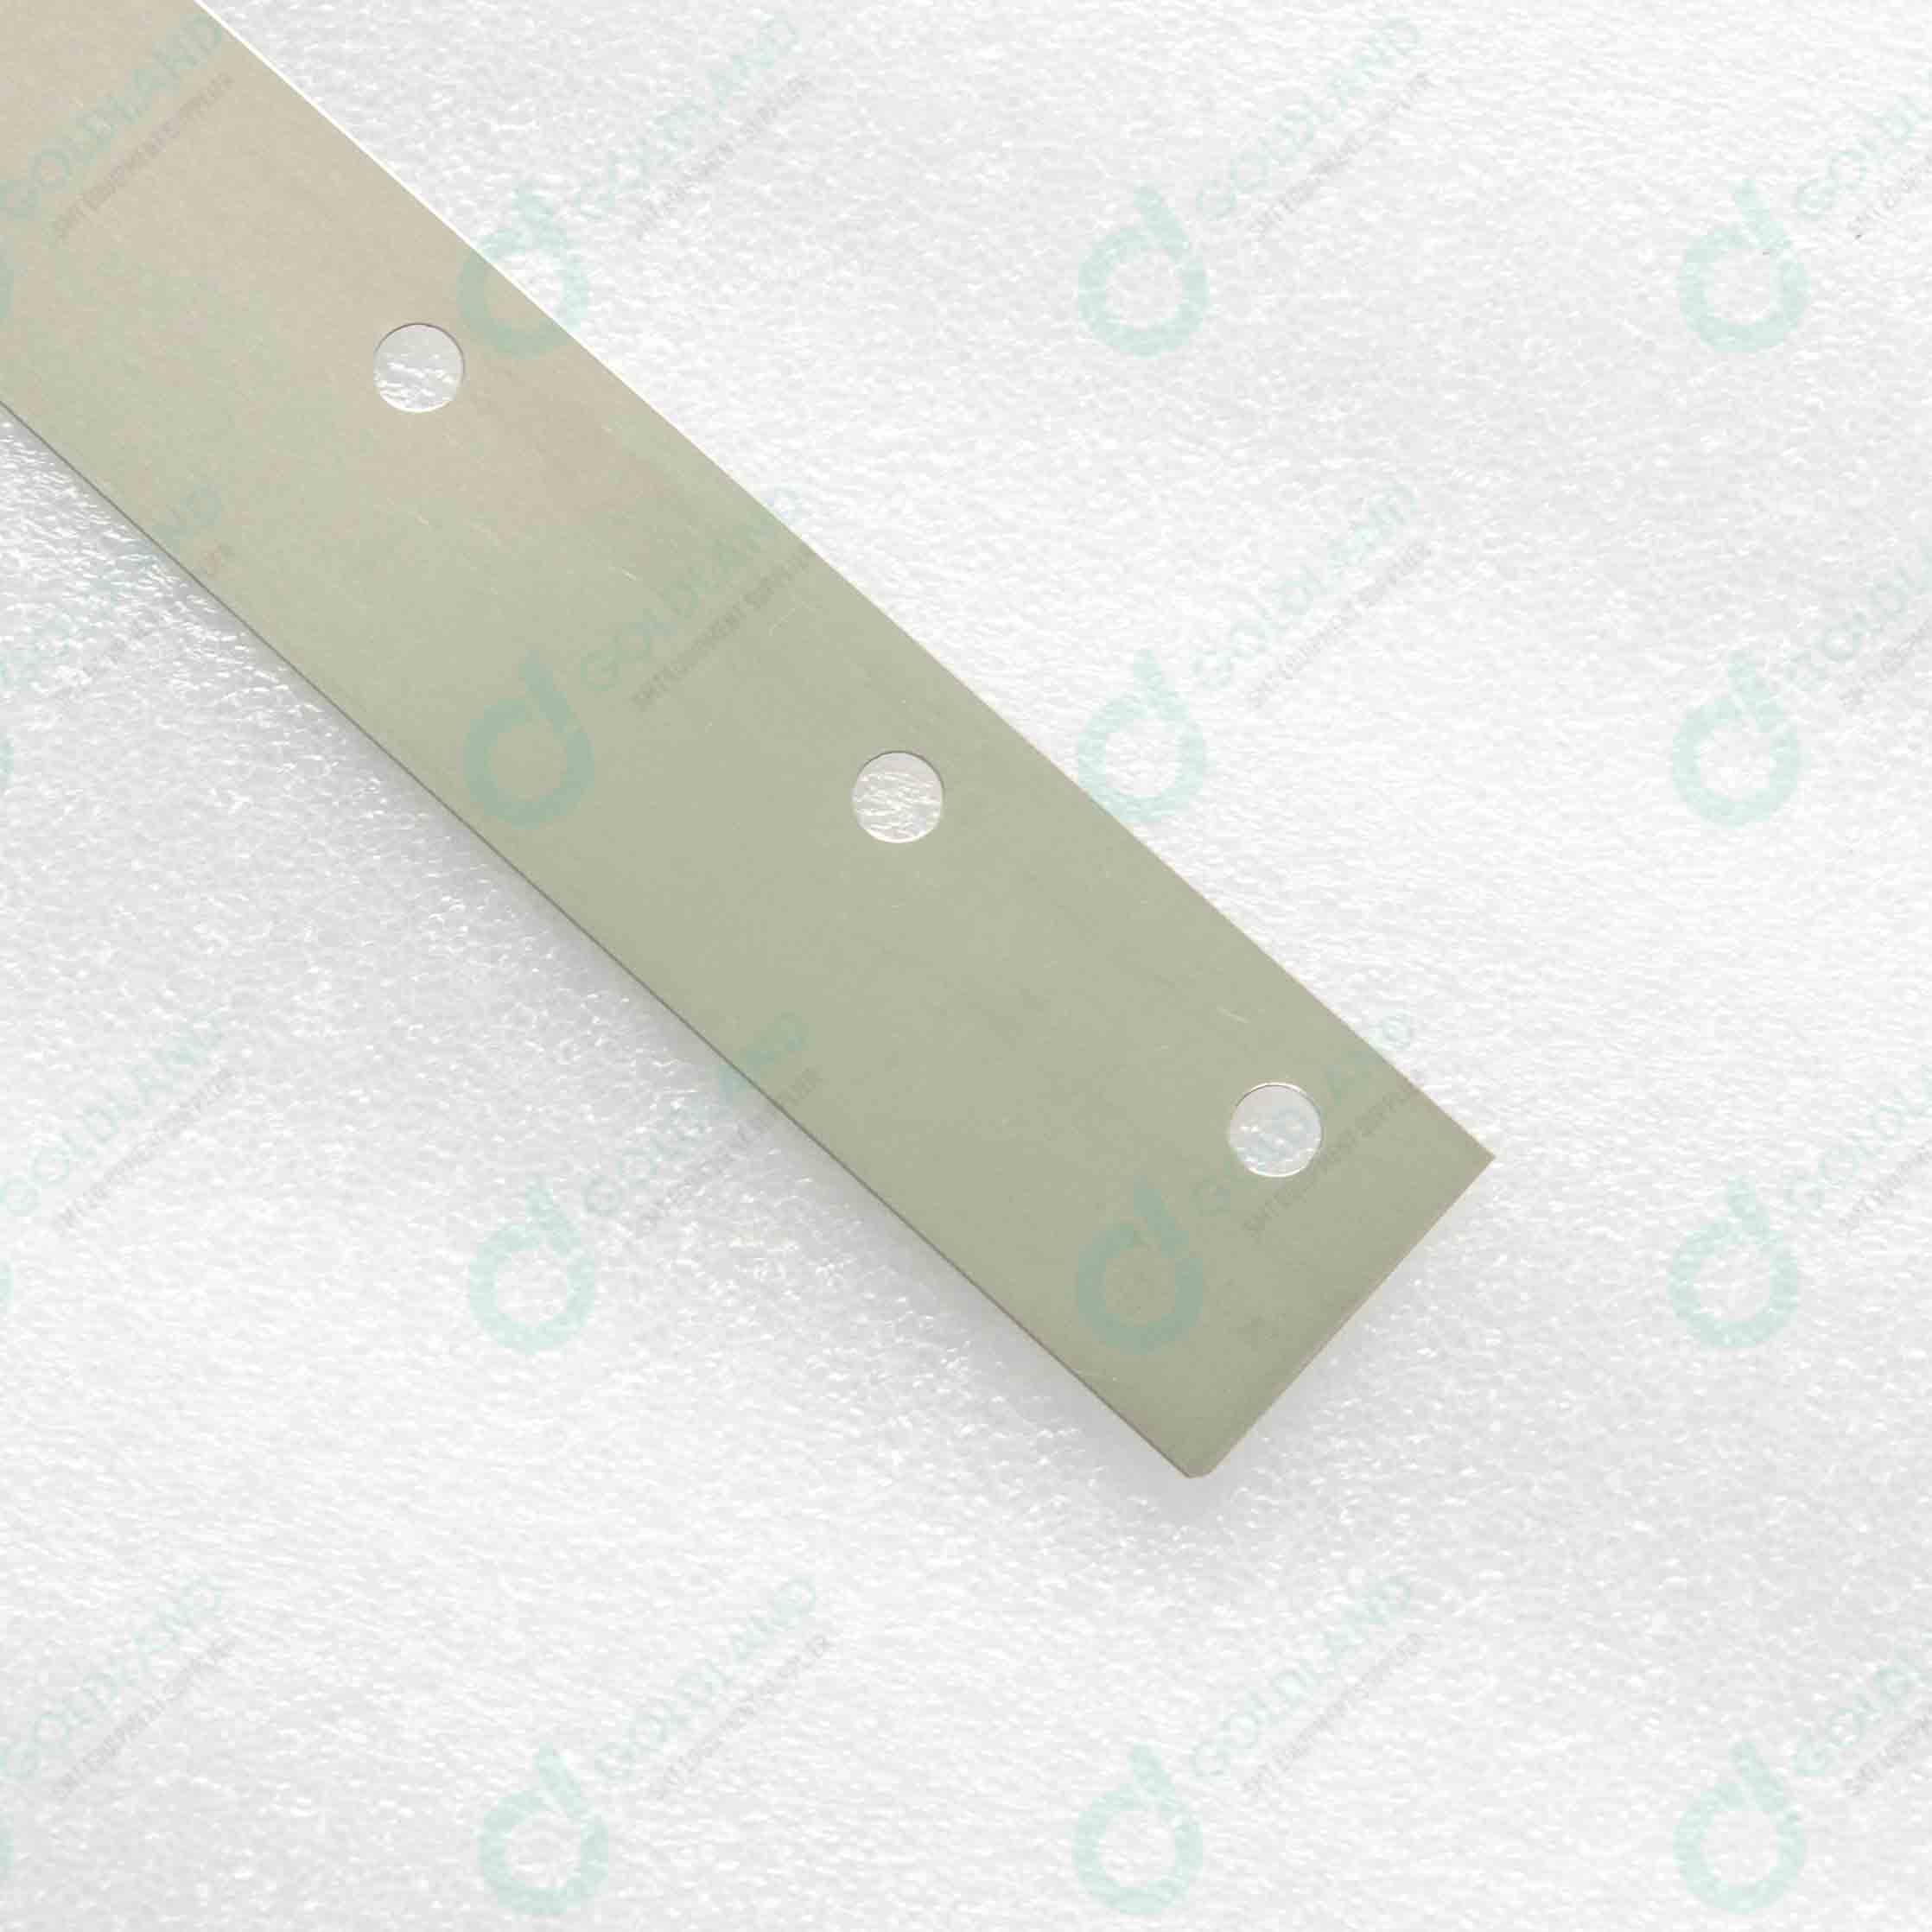 DEK ASM Squeegee Blade 400mm 45 deg for DEK SMT Printers Spare parts